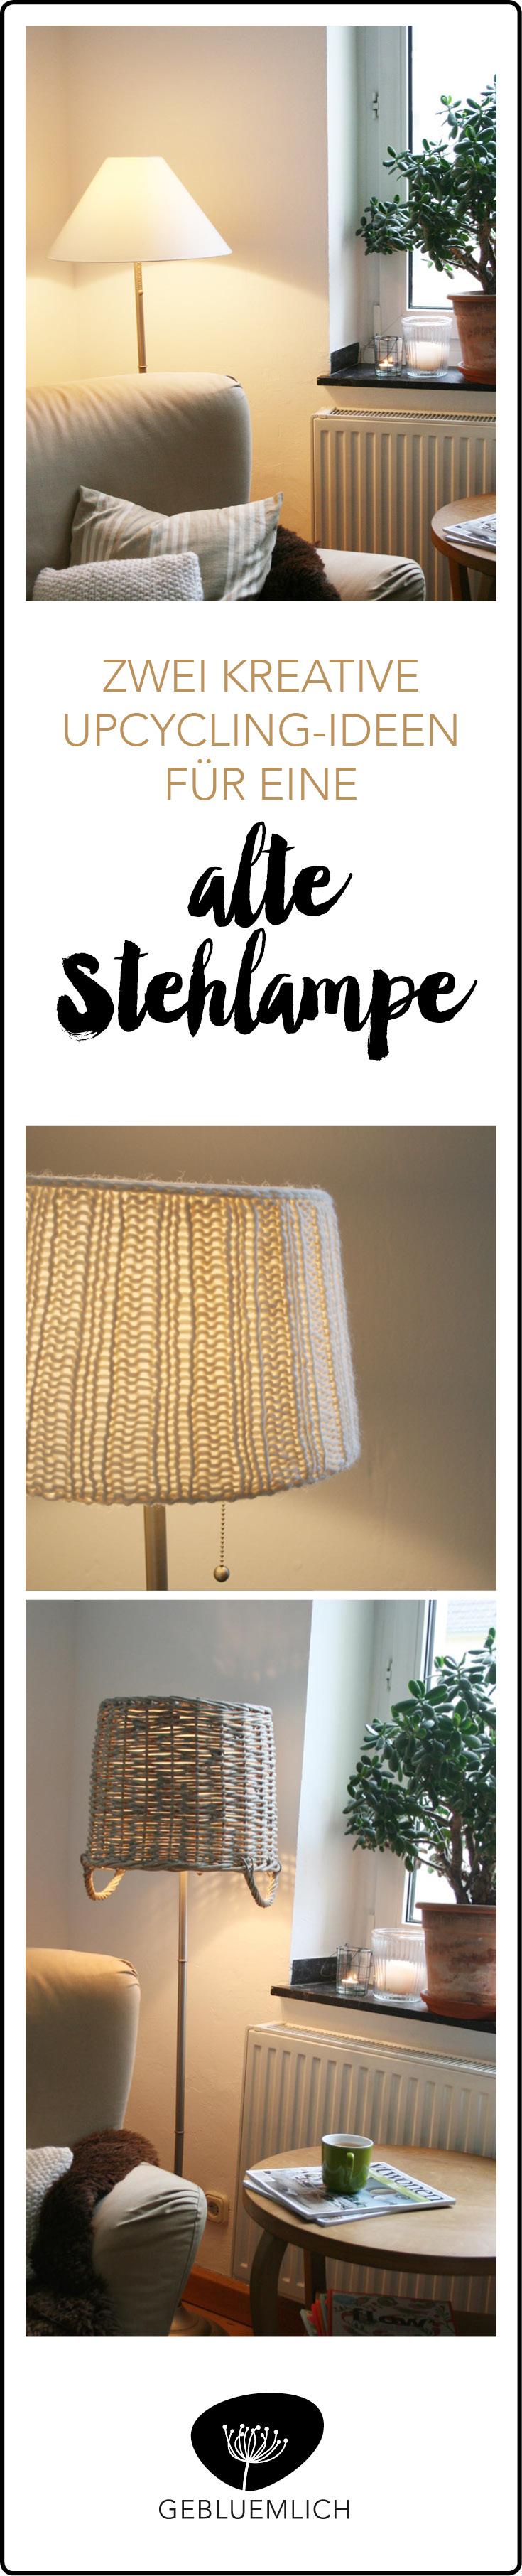 Upcycling-Ideen für alte Lampenschirme